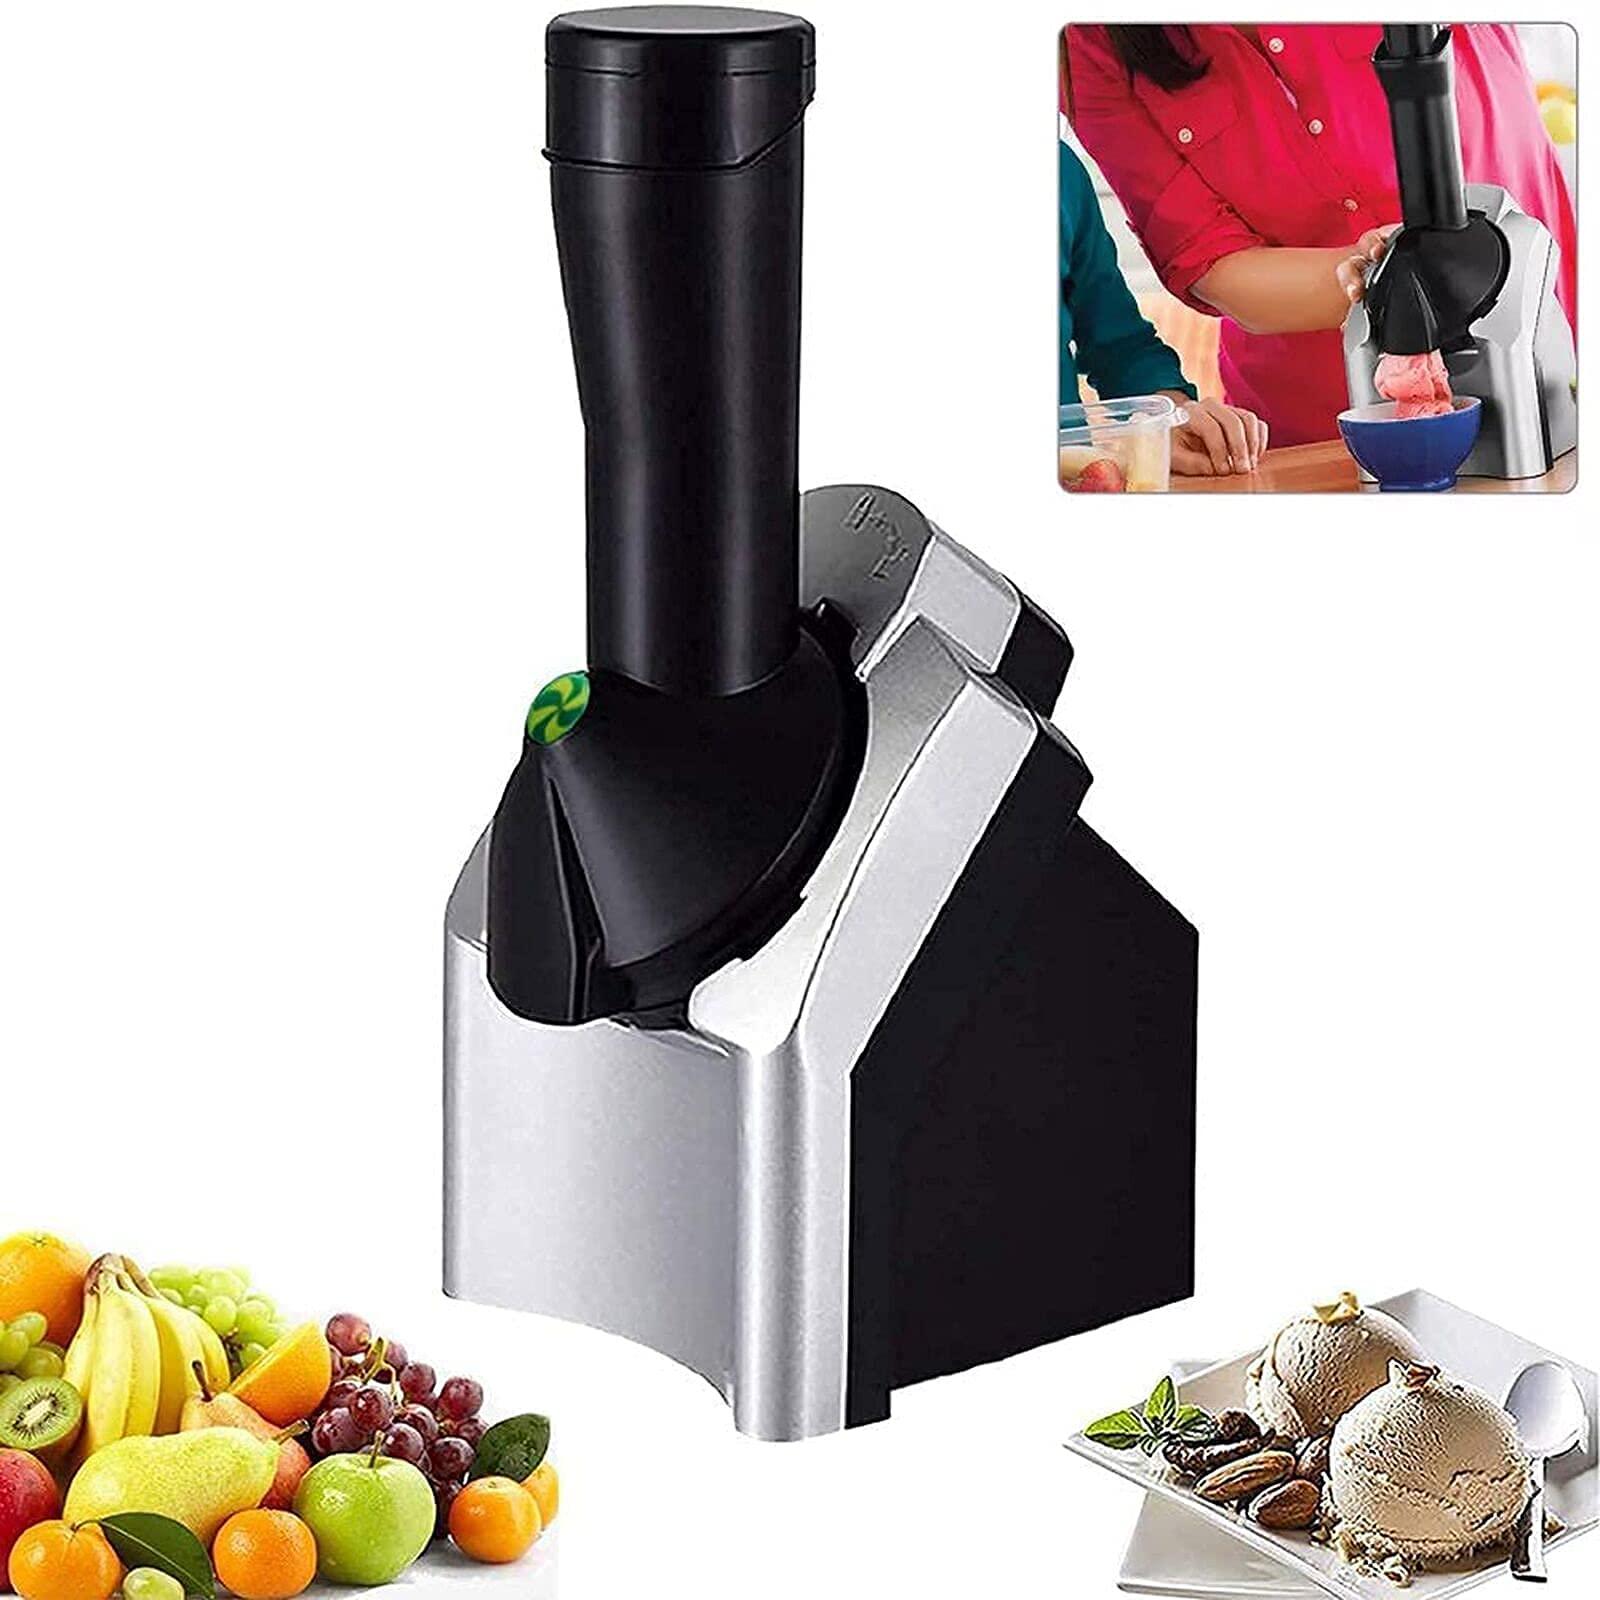 Home Ice Cream Maker MachinePortable Household Use Soft Serve Ice Cream MachineMake